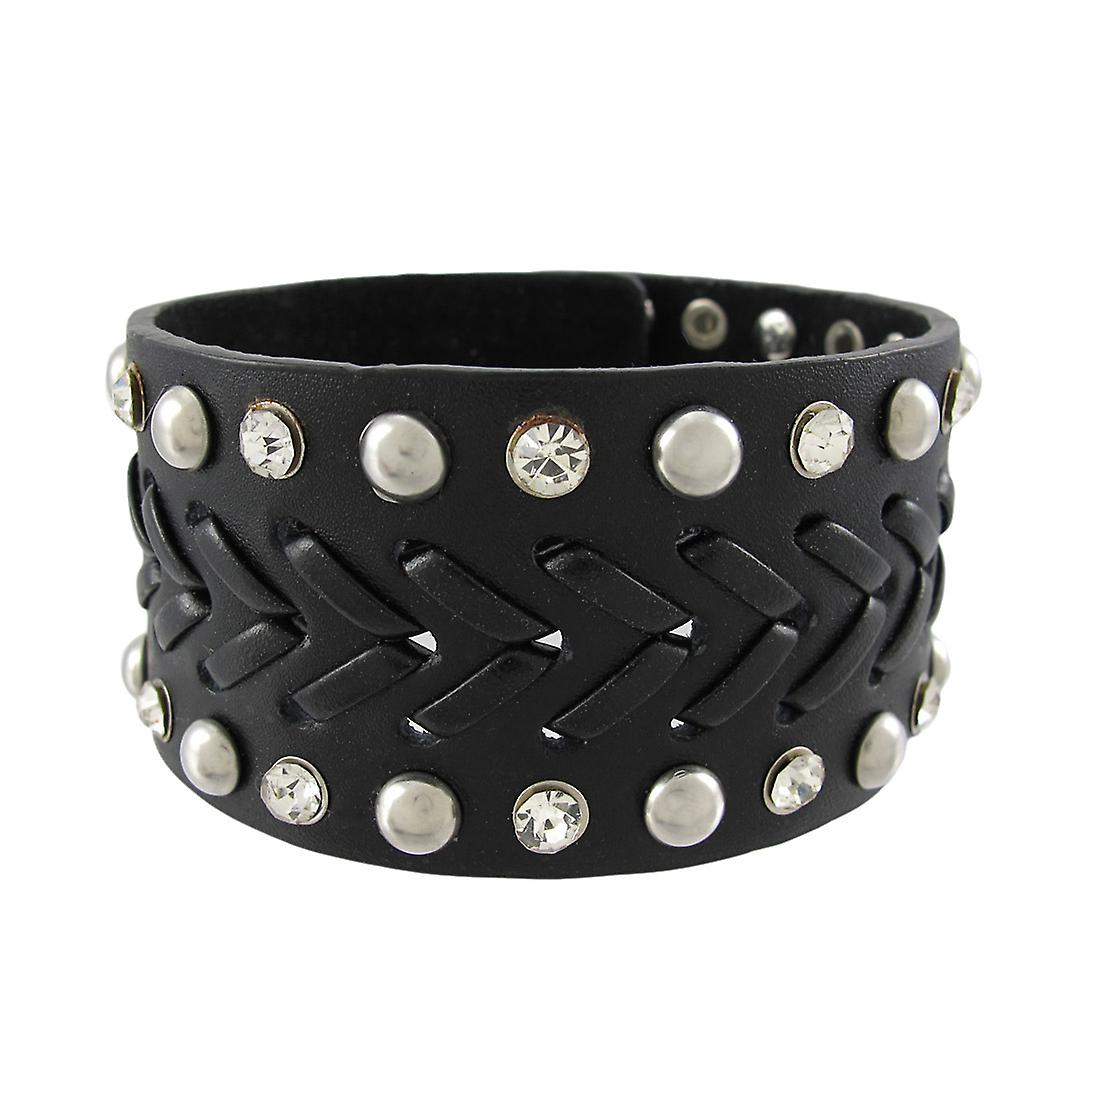 Black Leather Chrome Studded Rhinestone Single Snap Clasp Wristband